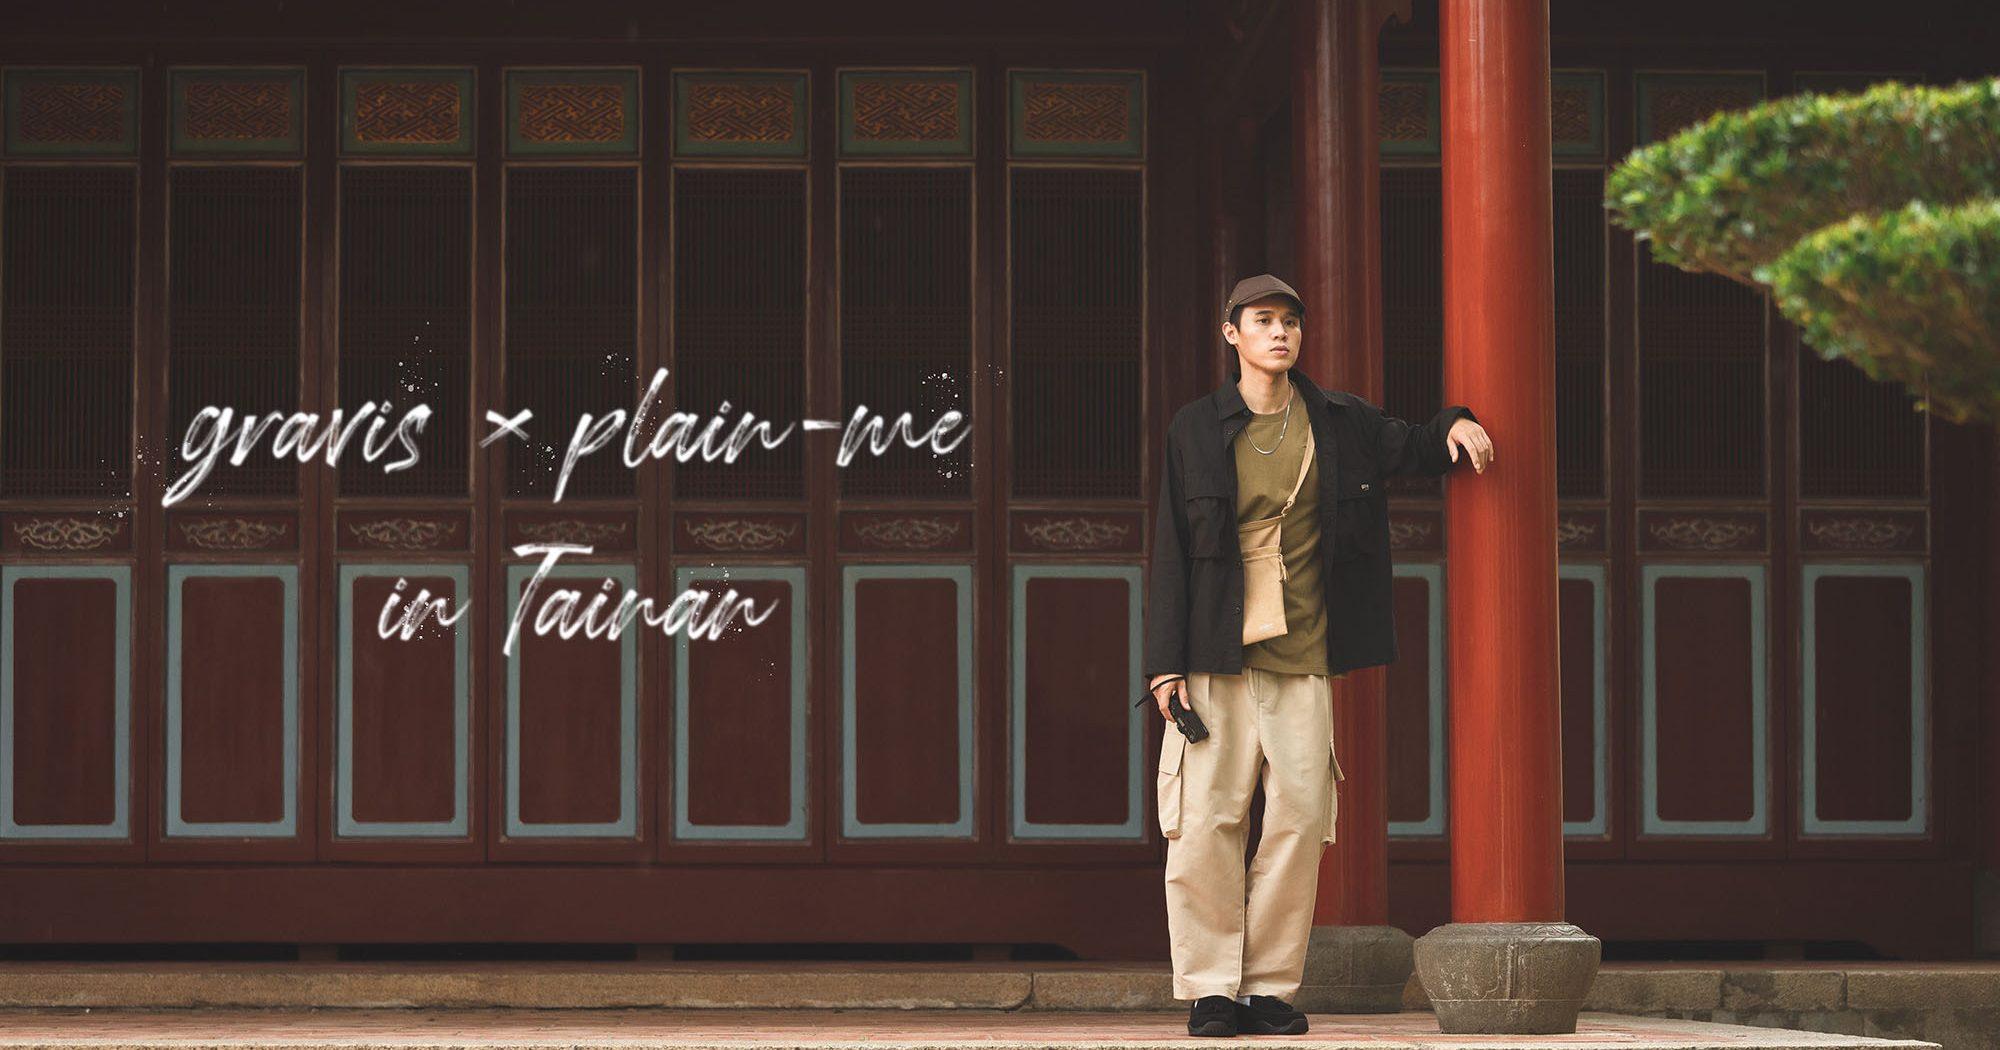 20200819 plain-me tainan-1074